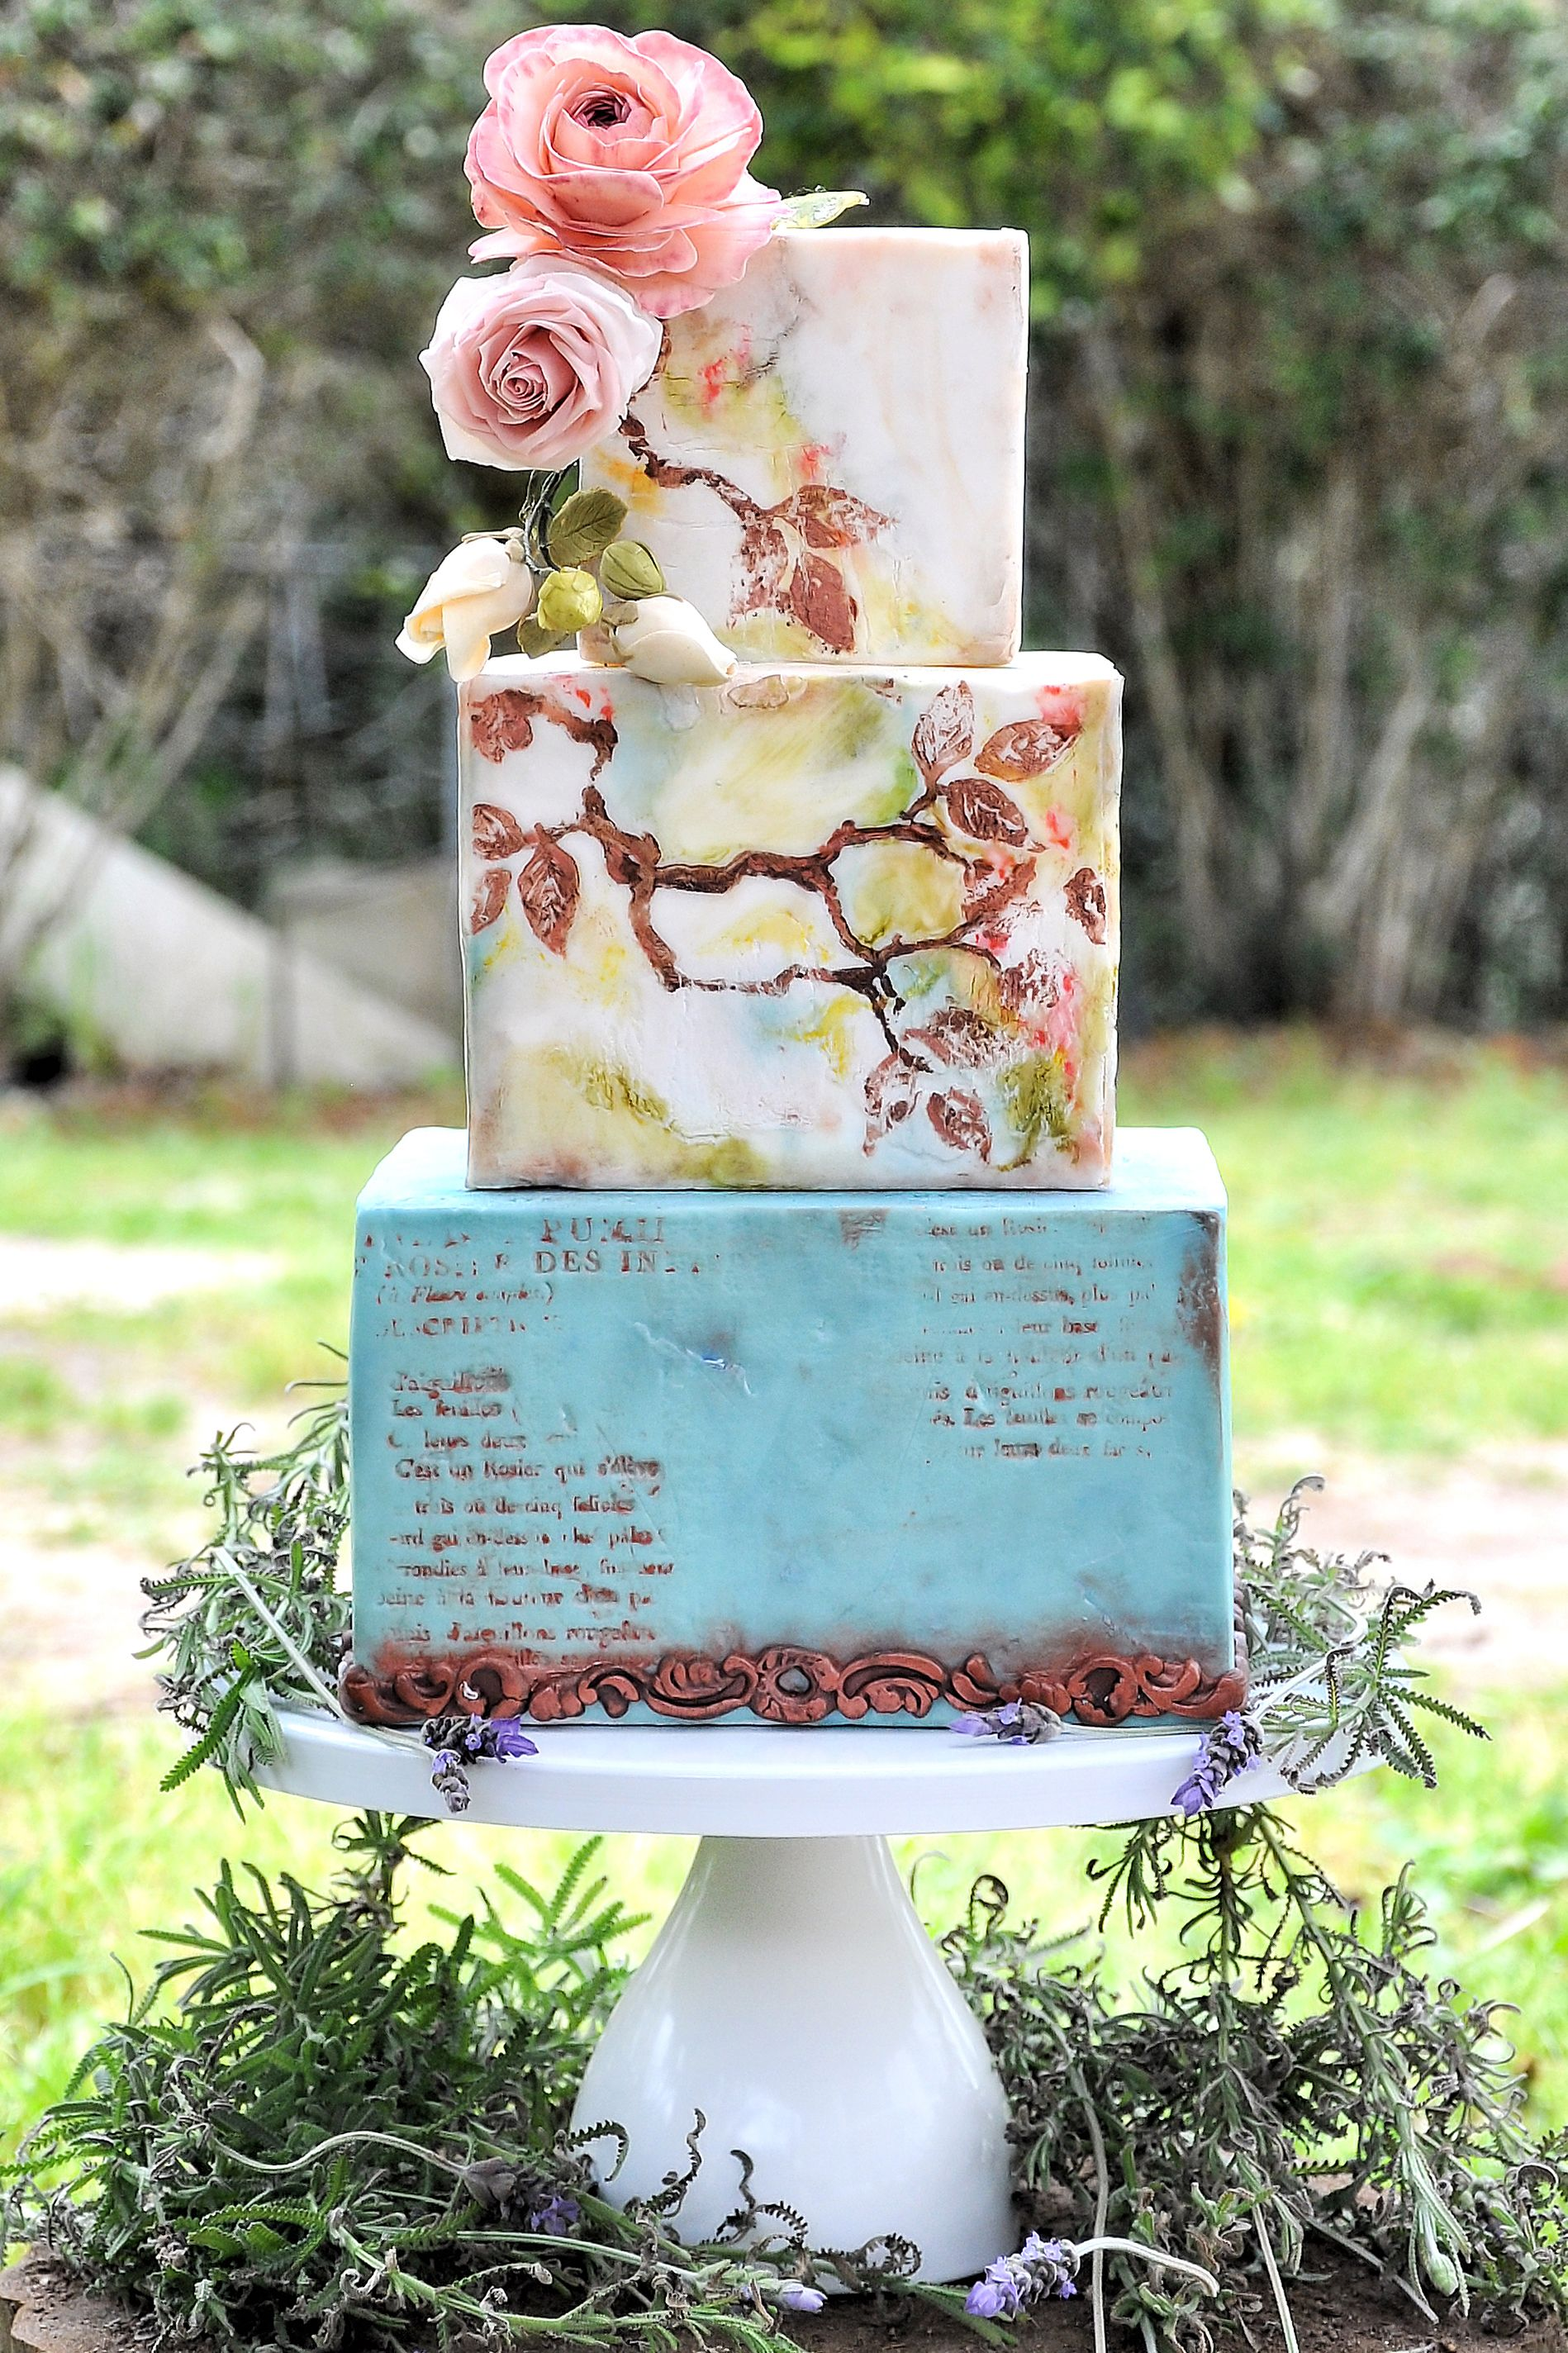 12 Inch Round Modern Metal Wedding Cake Stand White In 2020